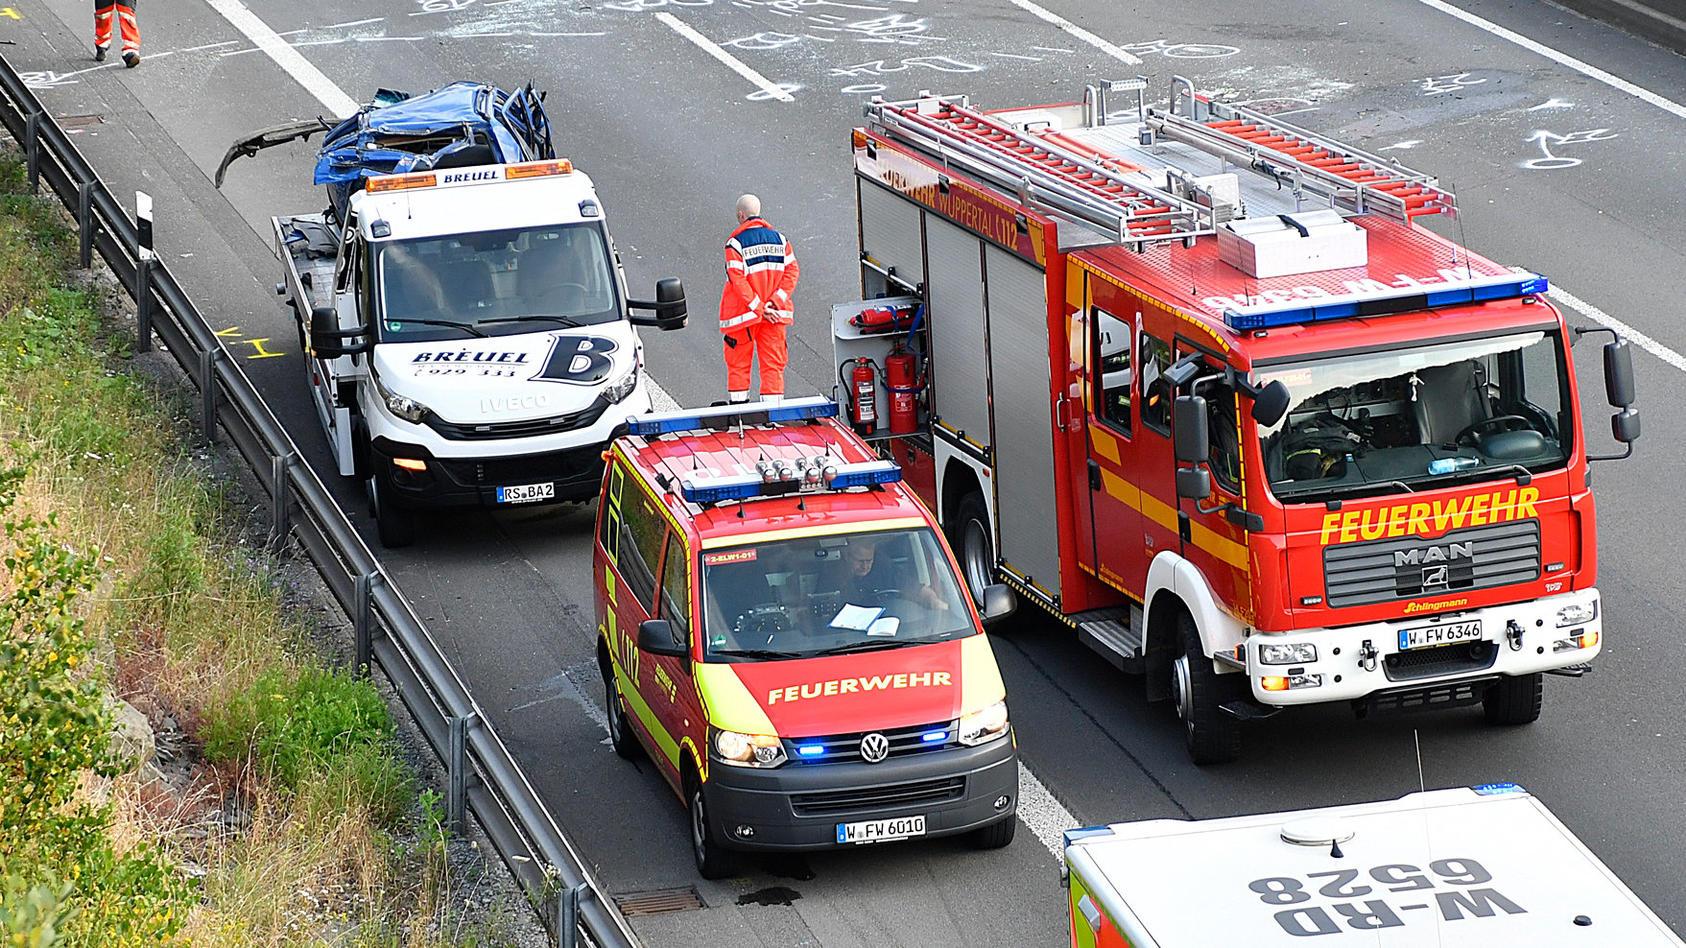 Schwerer Unfall auf der A1 bei Wuppertal.